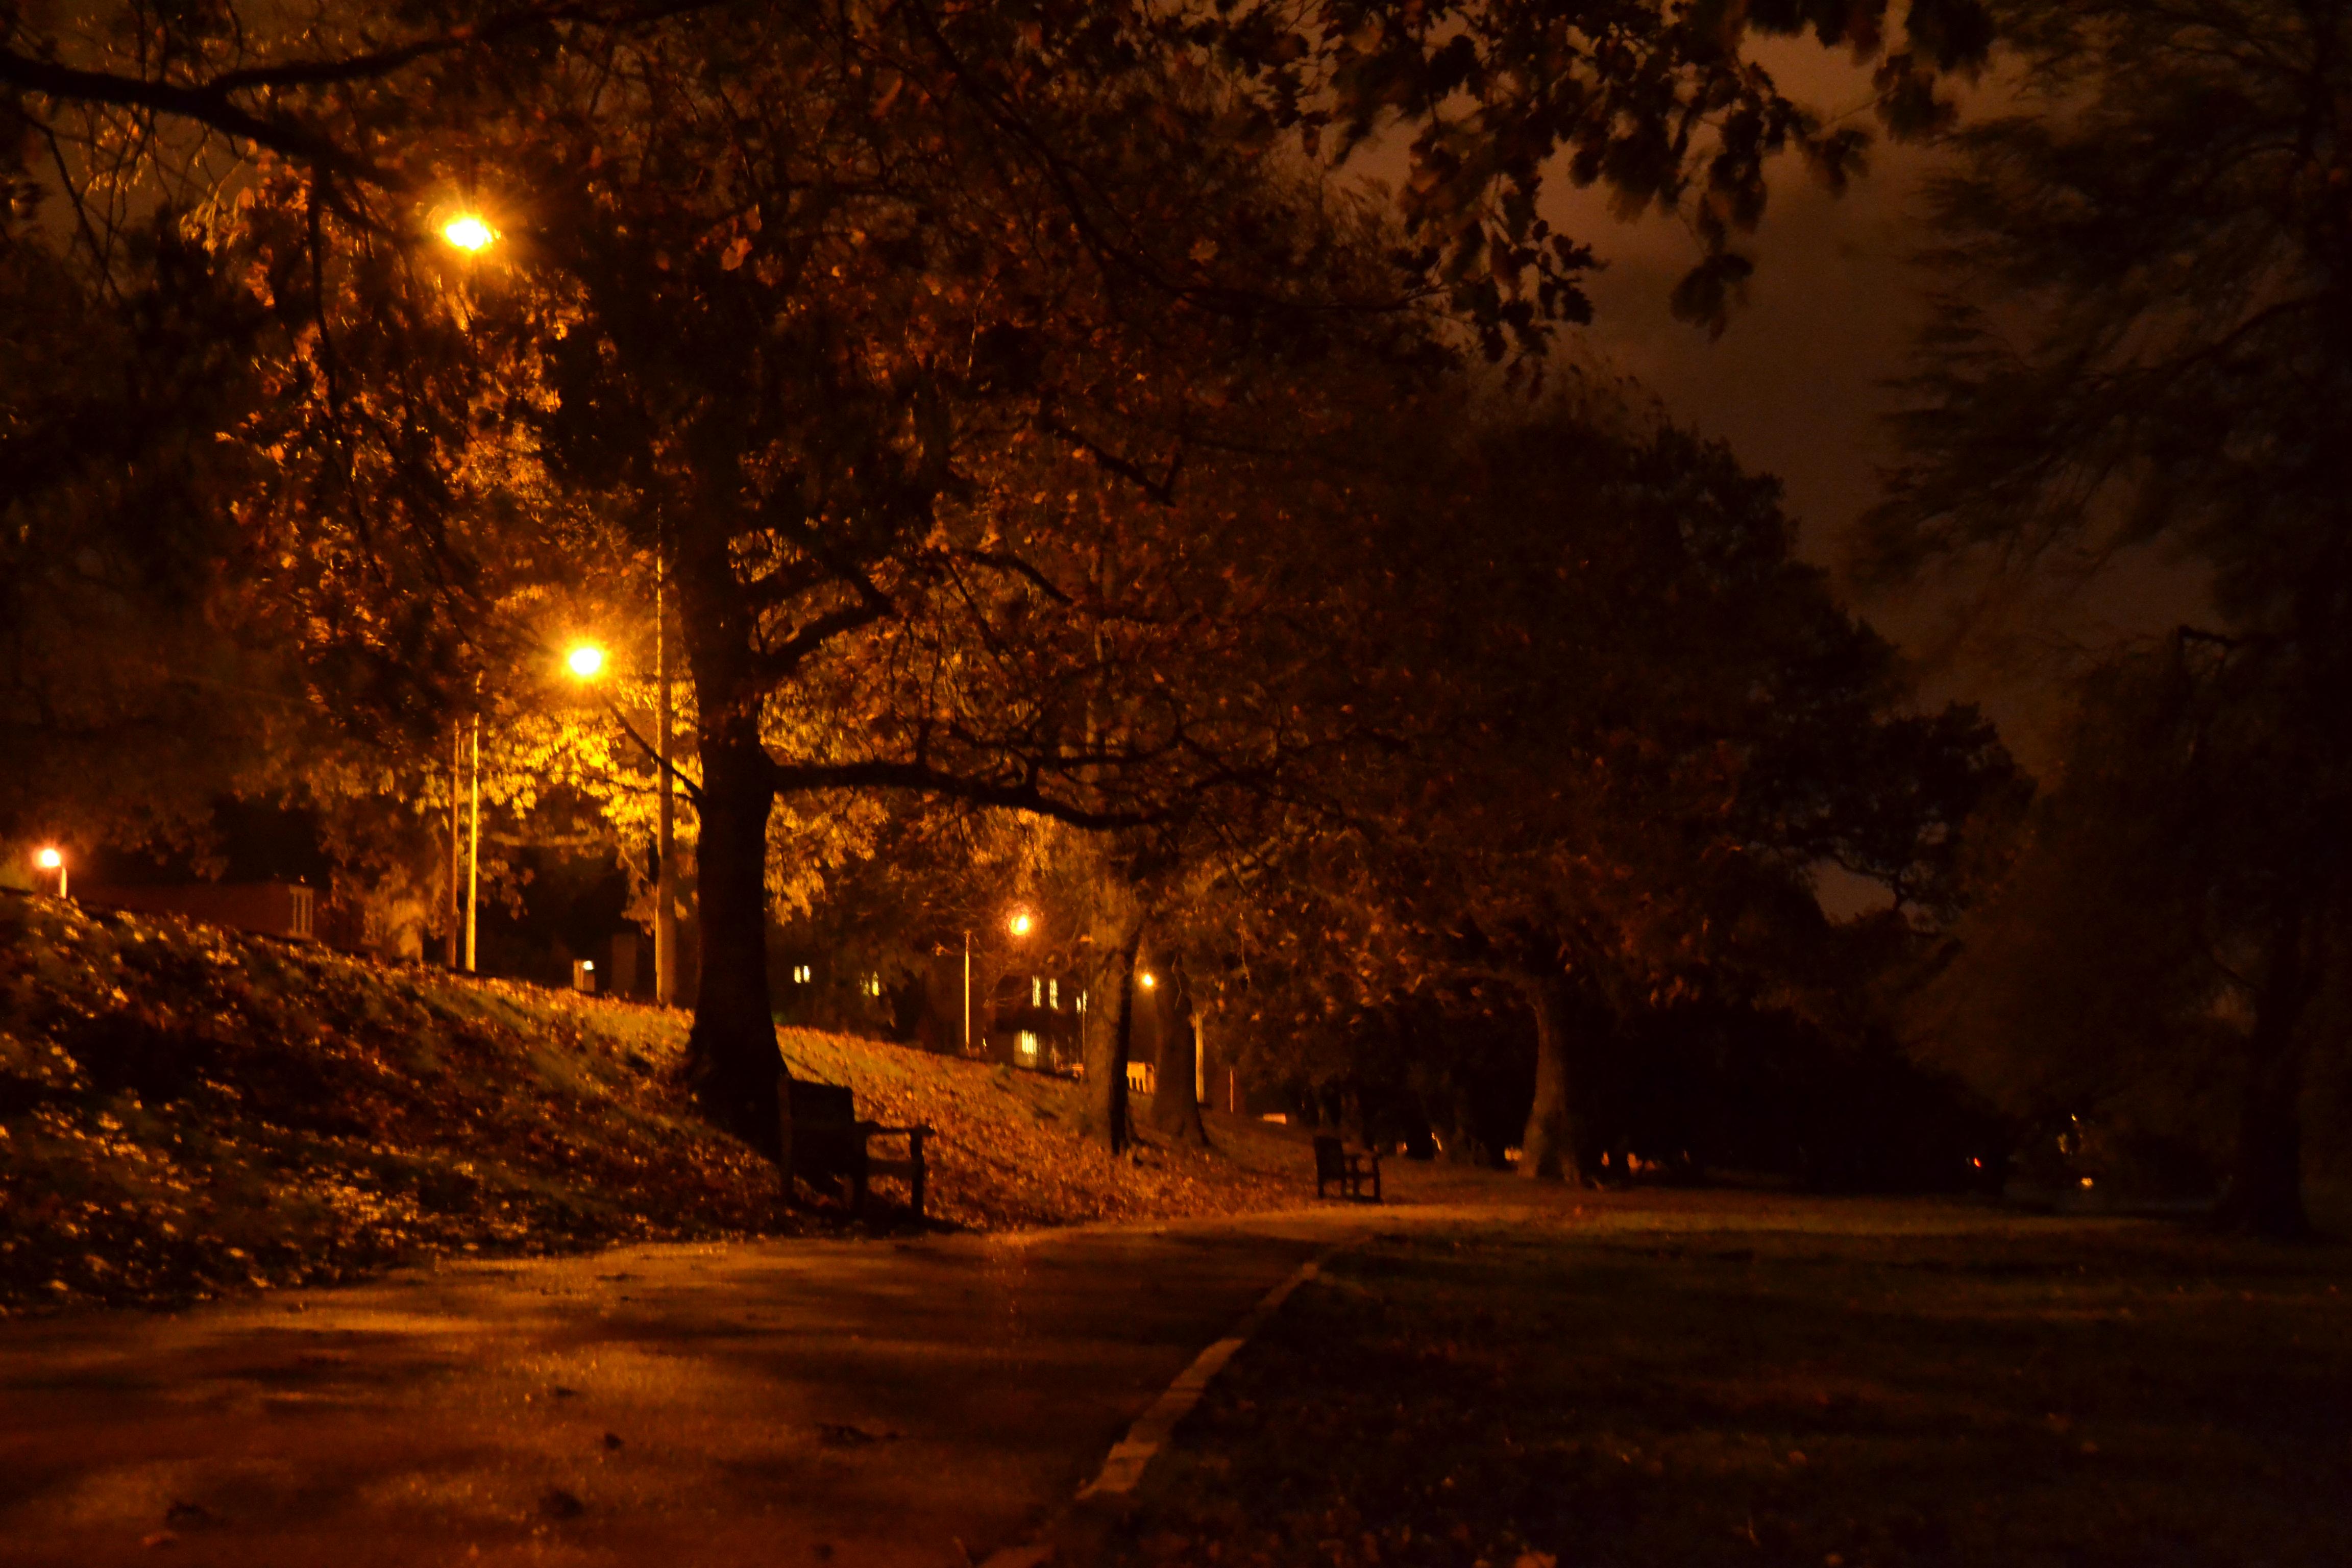 Wallpaper Autumn Night Dark Cardiff Atmosphere Roathpark 4608x3072 936835 Hd Wallpapers Wallhere